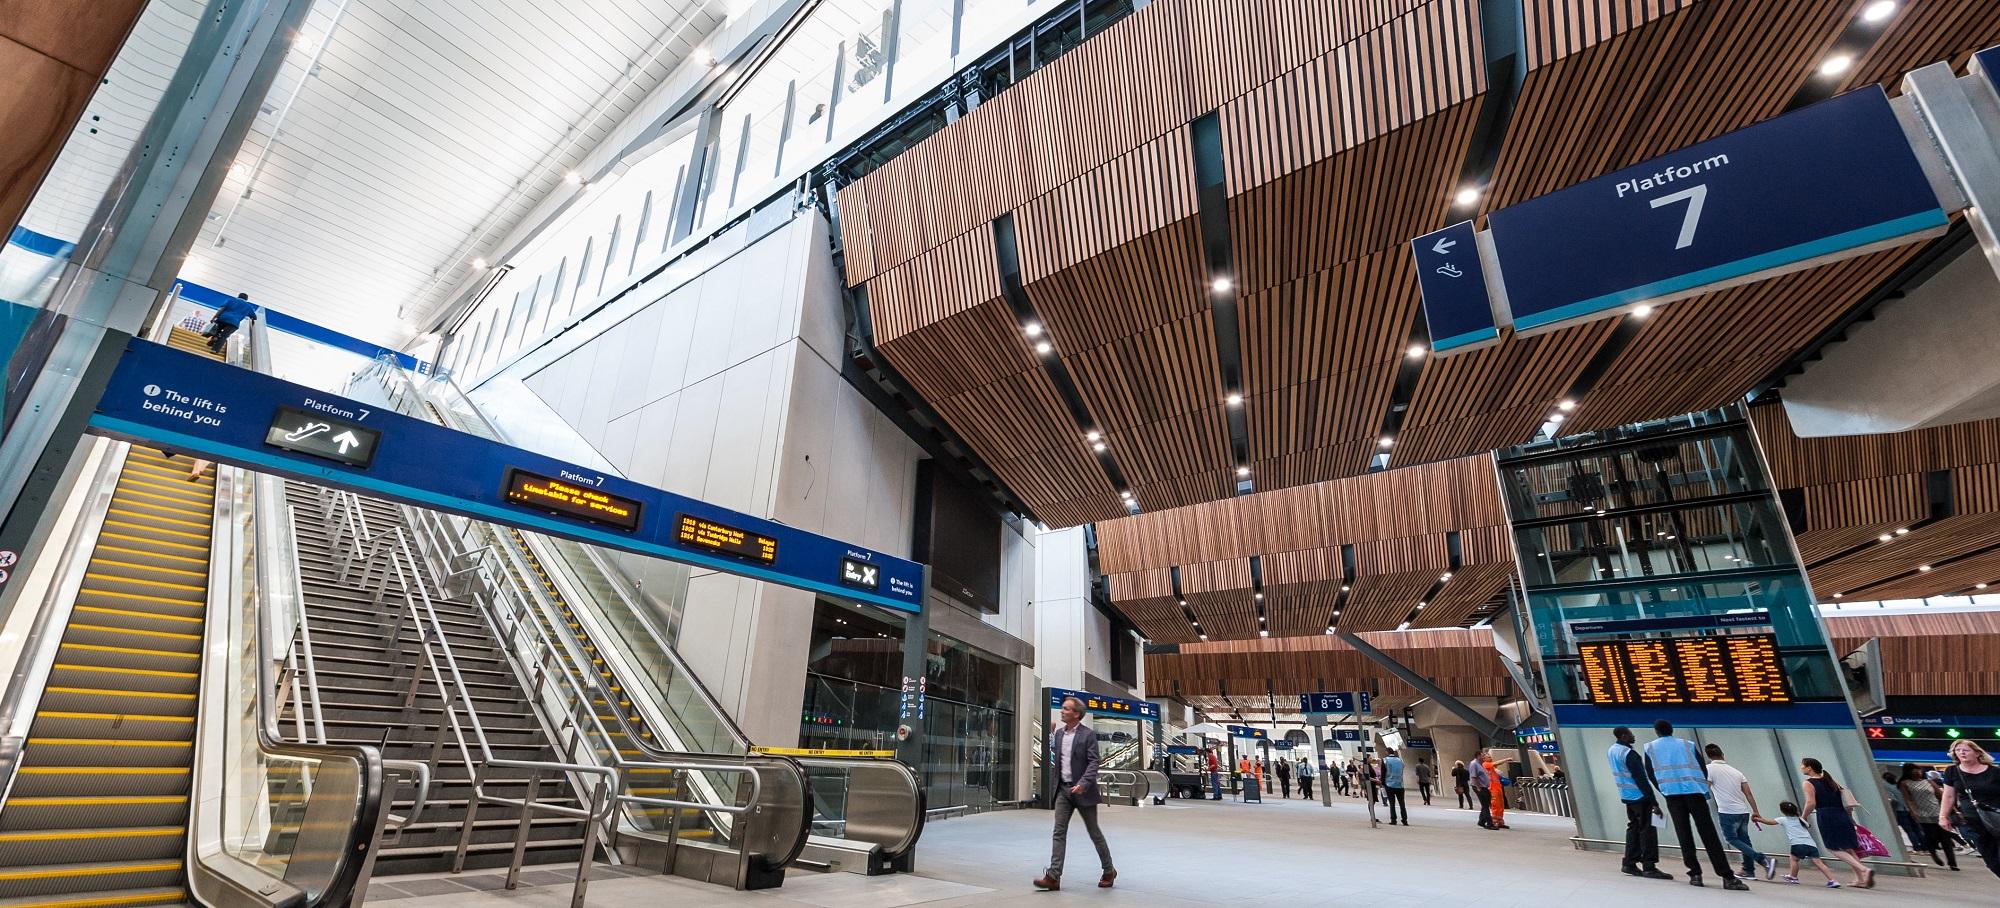 London Bridge Station Redelopment